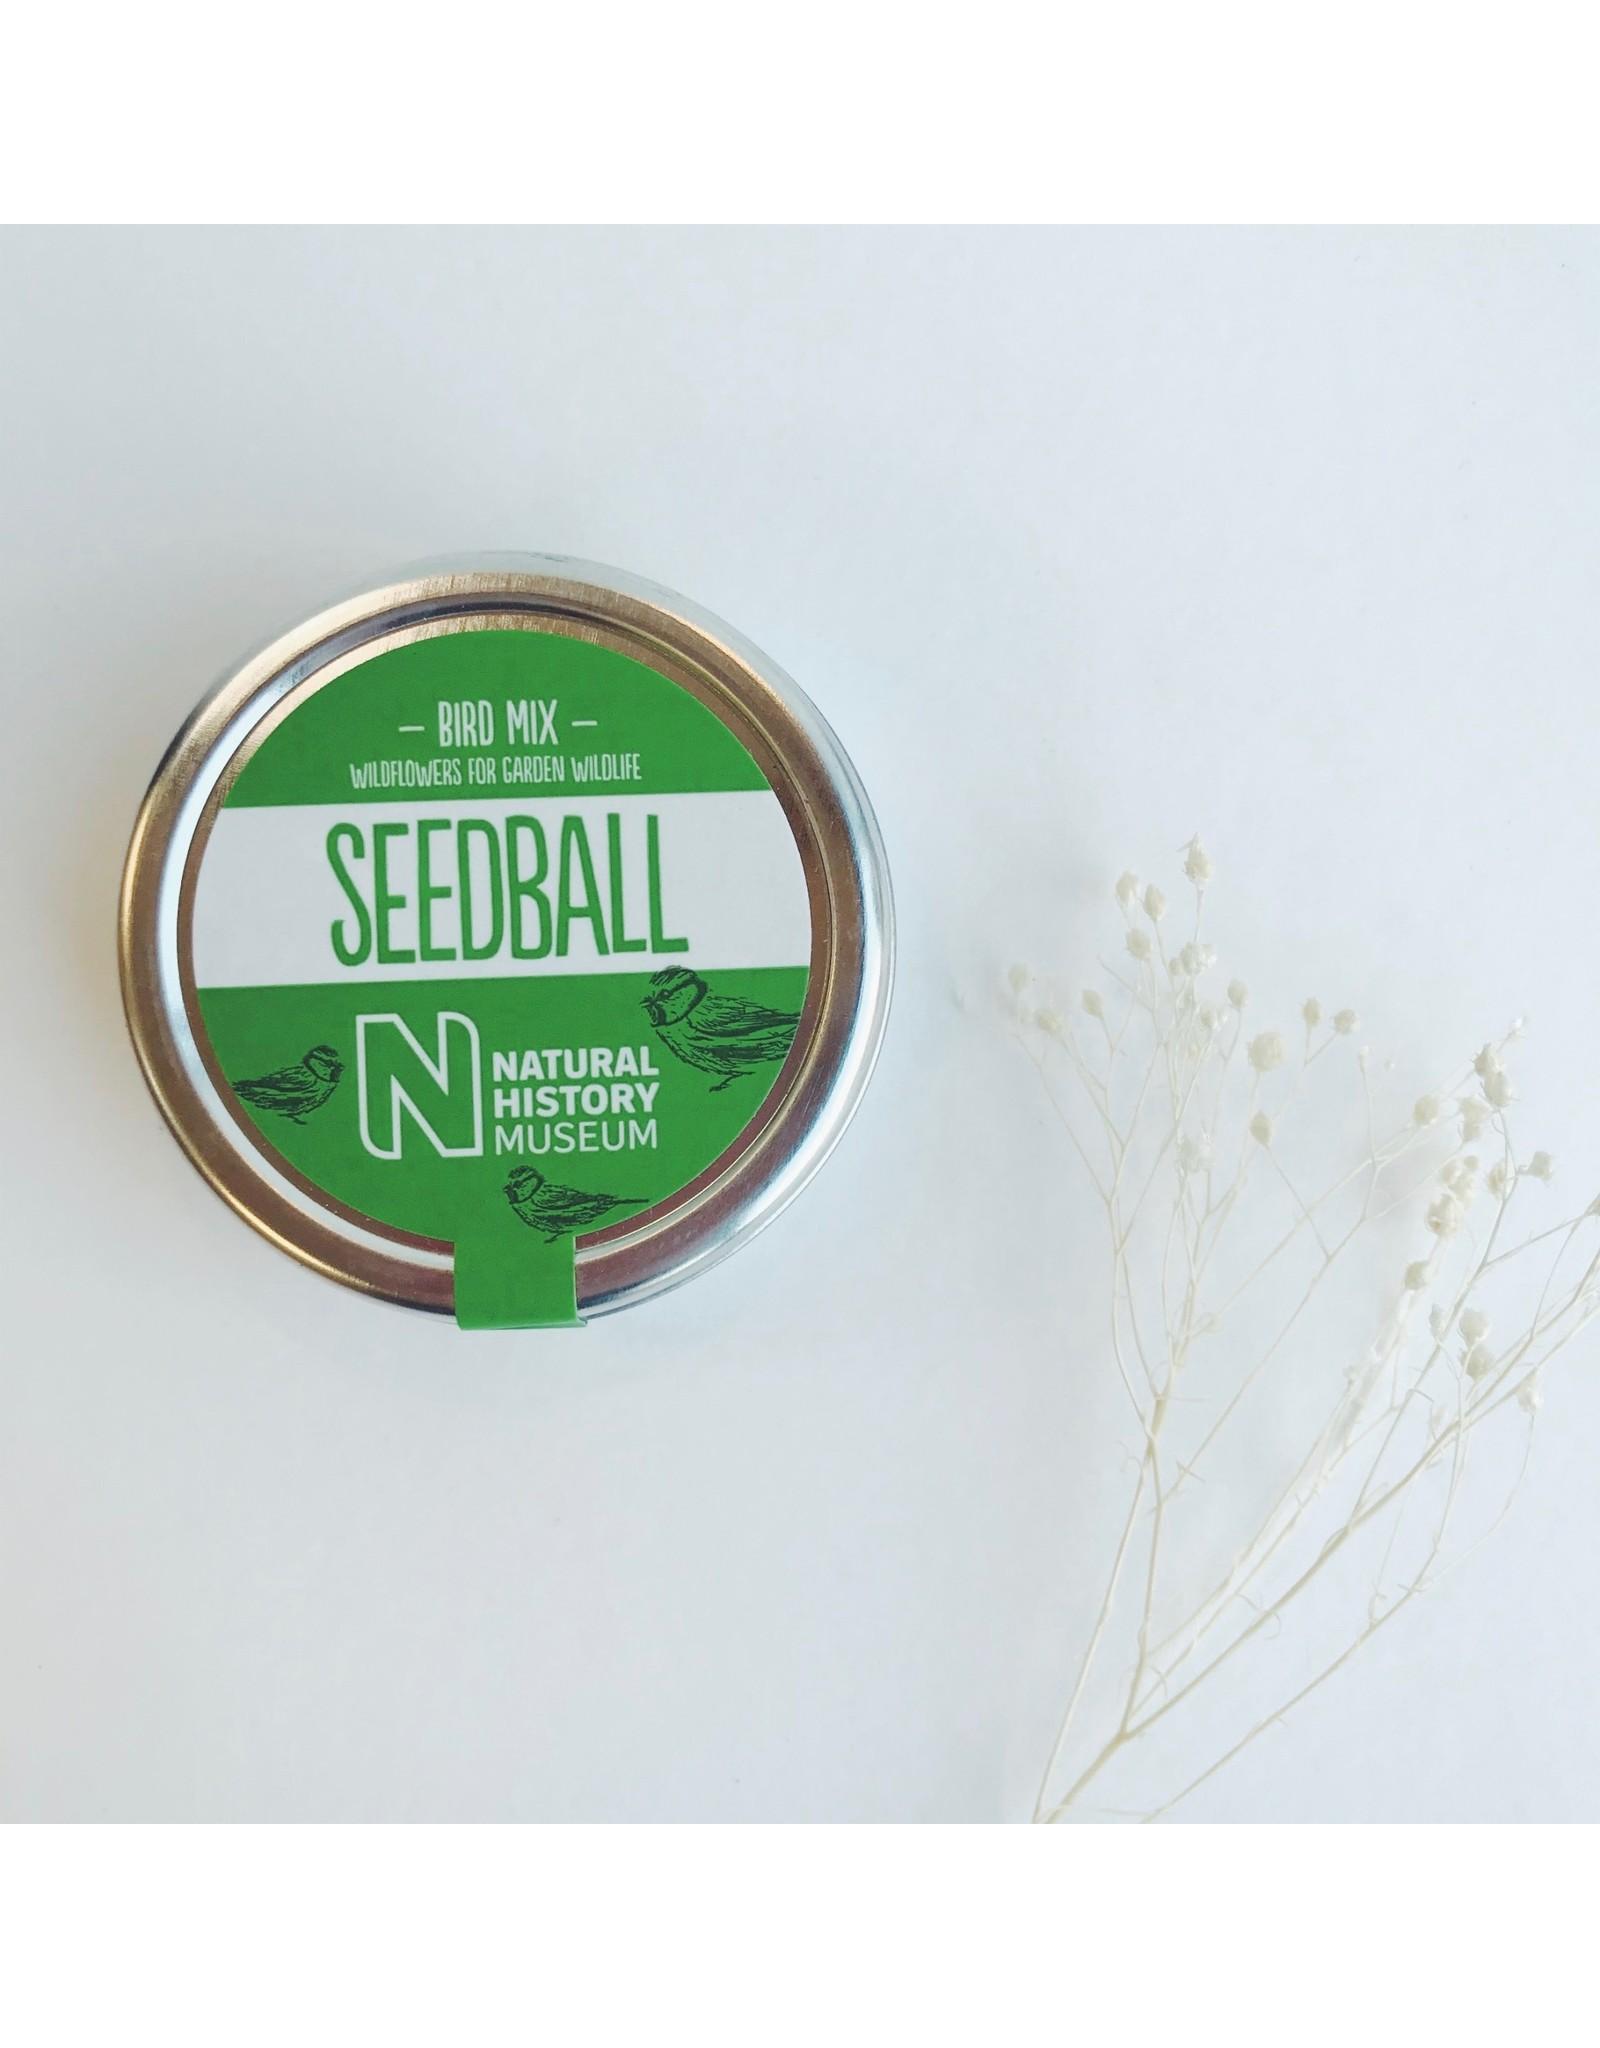 Seedball Mixes